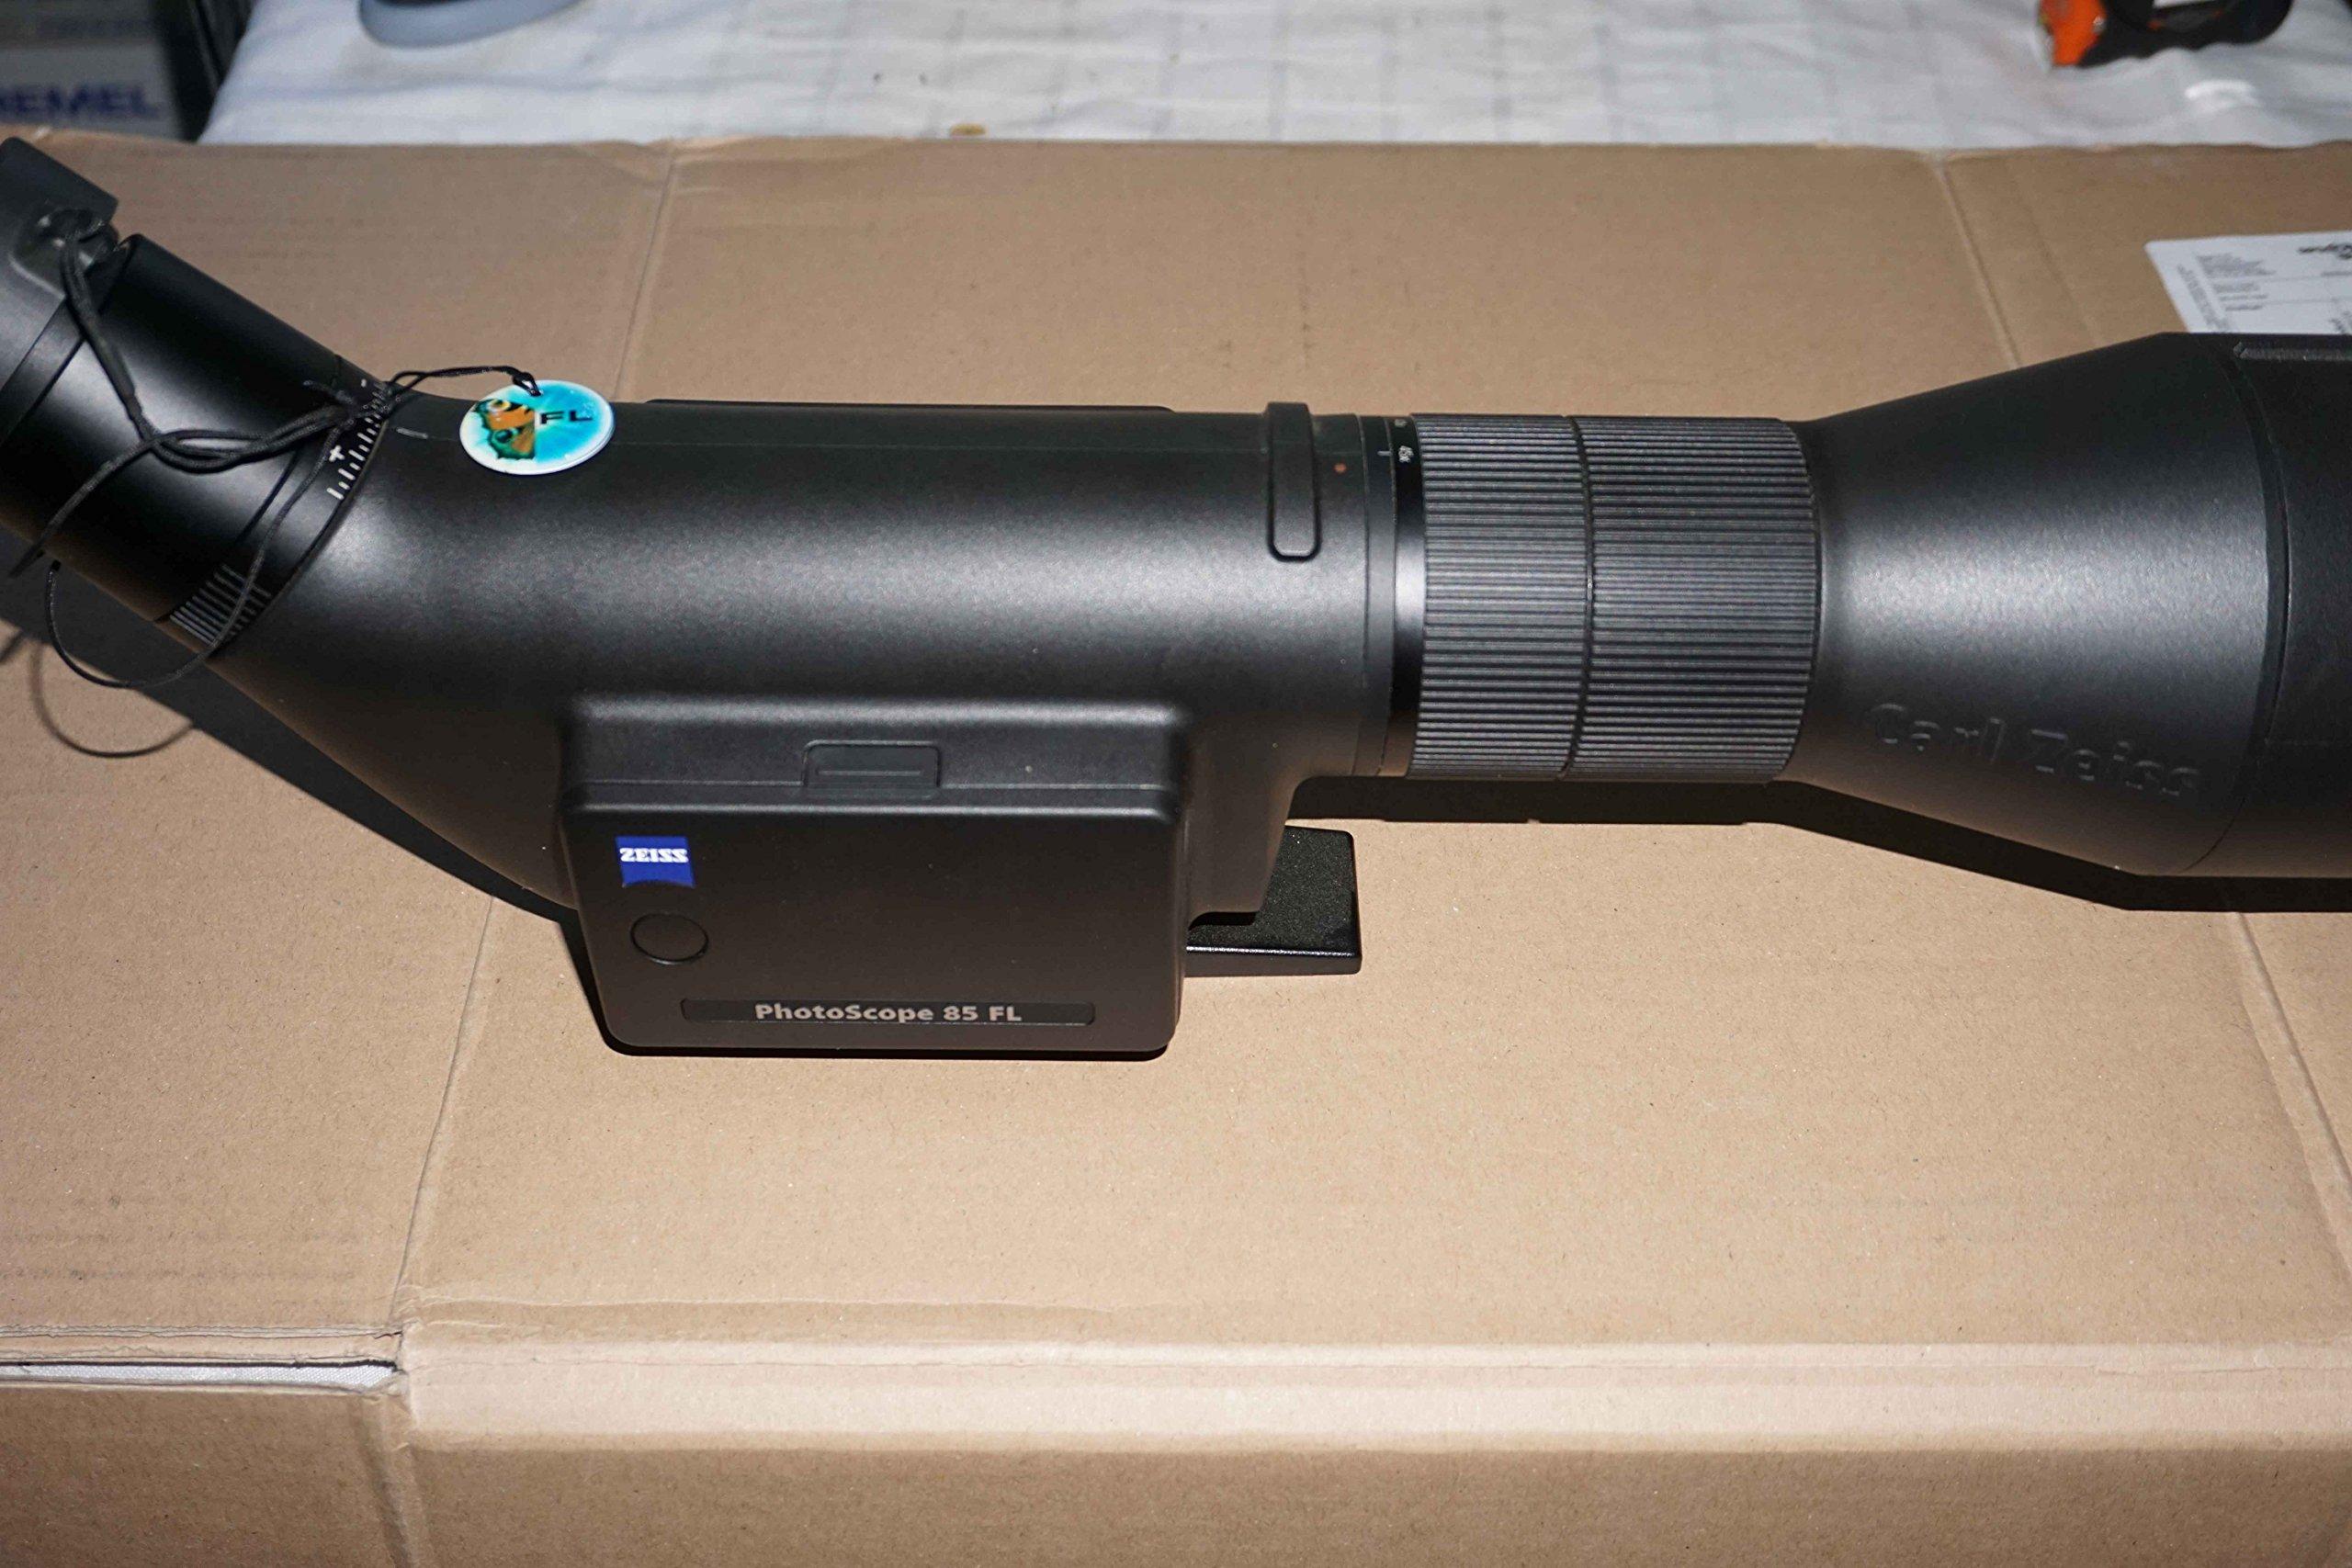 Zeiss digital spektiv victory photoscope 15 45x85mm t* fl: amazon.de